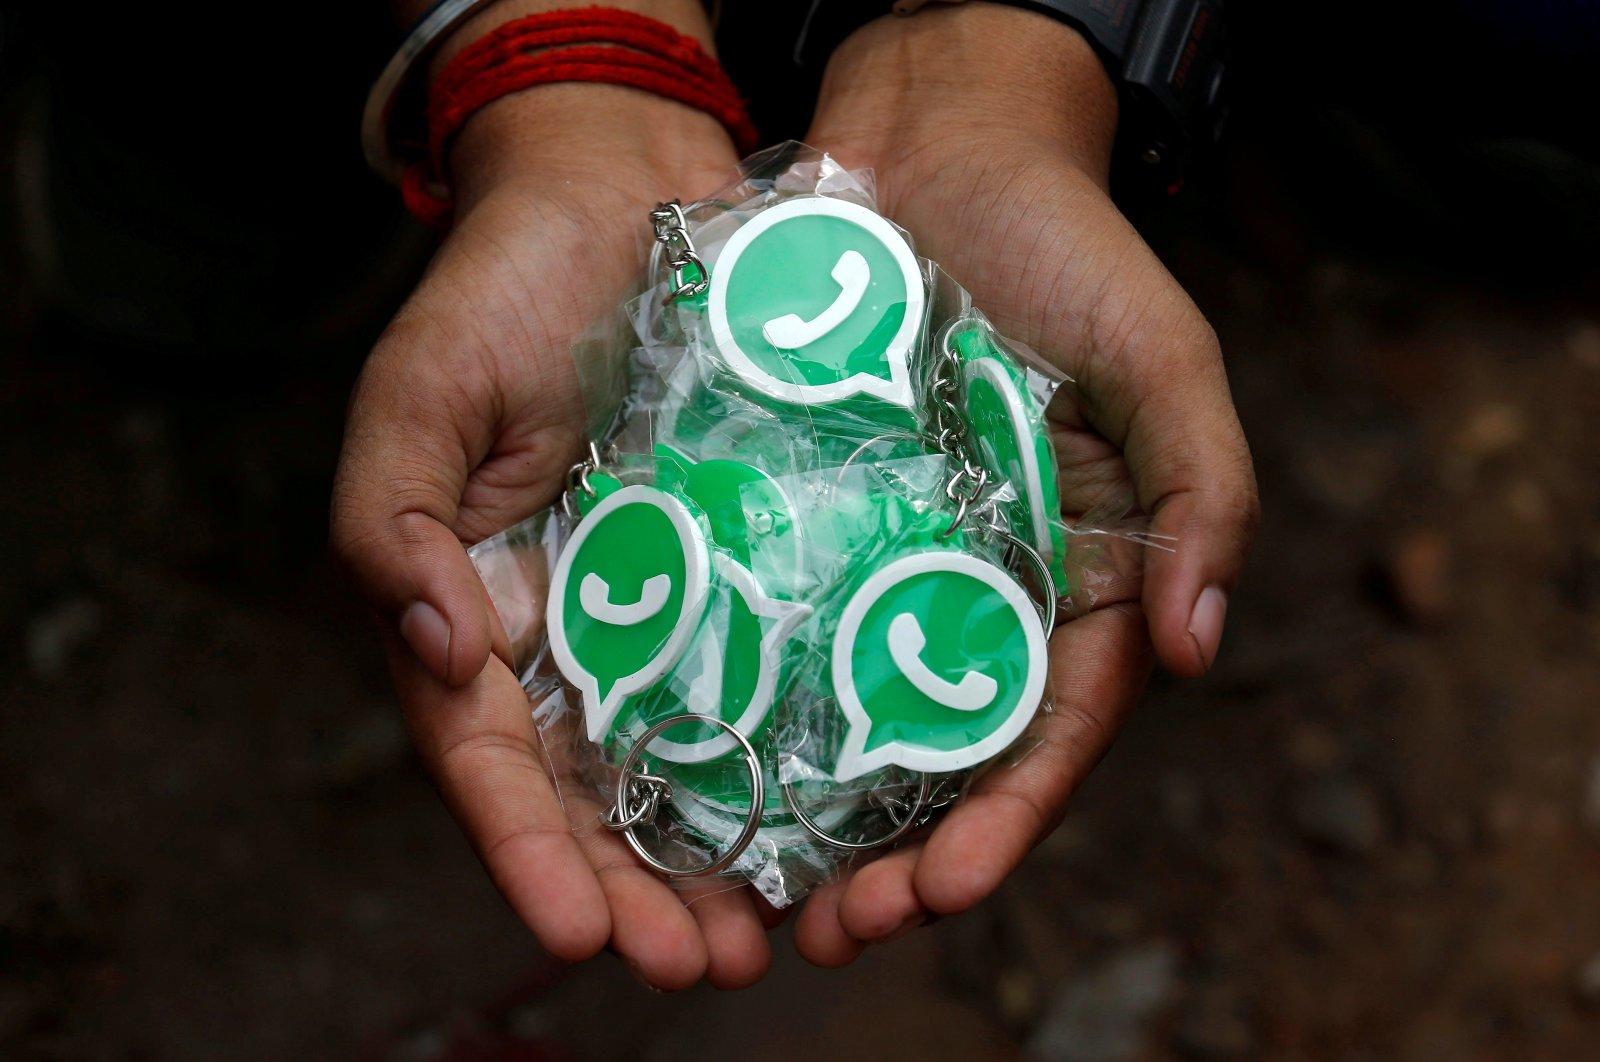 Key chains with the logo of WhatsApp, Kolkata, India, Oct. 9, 2018. (Reuters Photo)